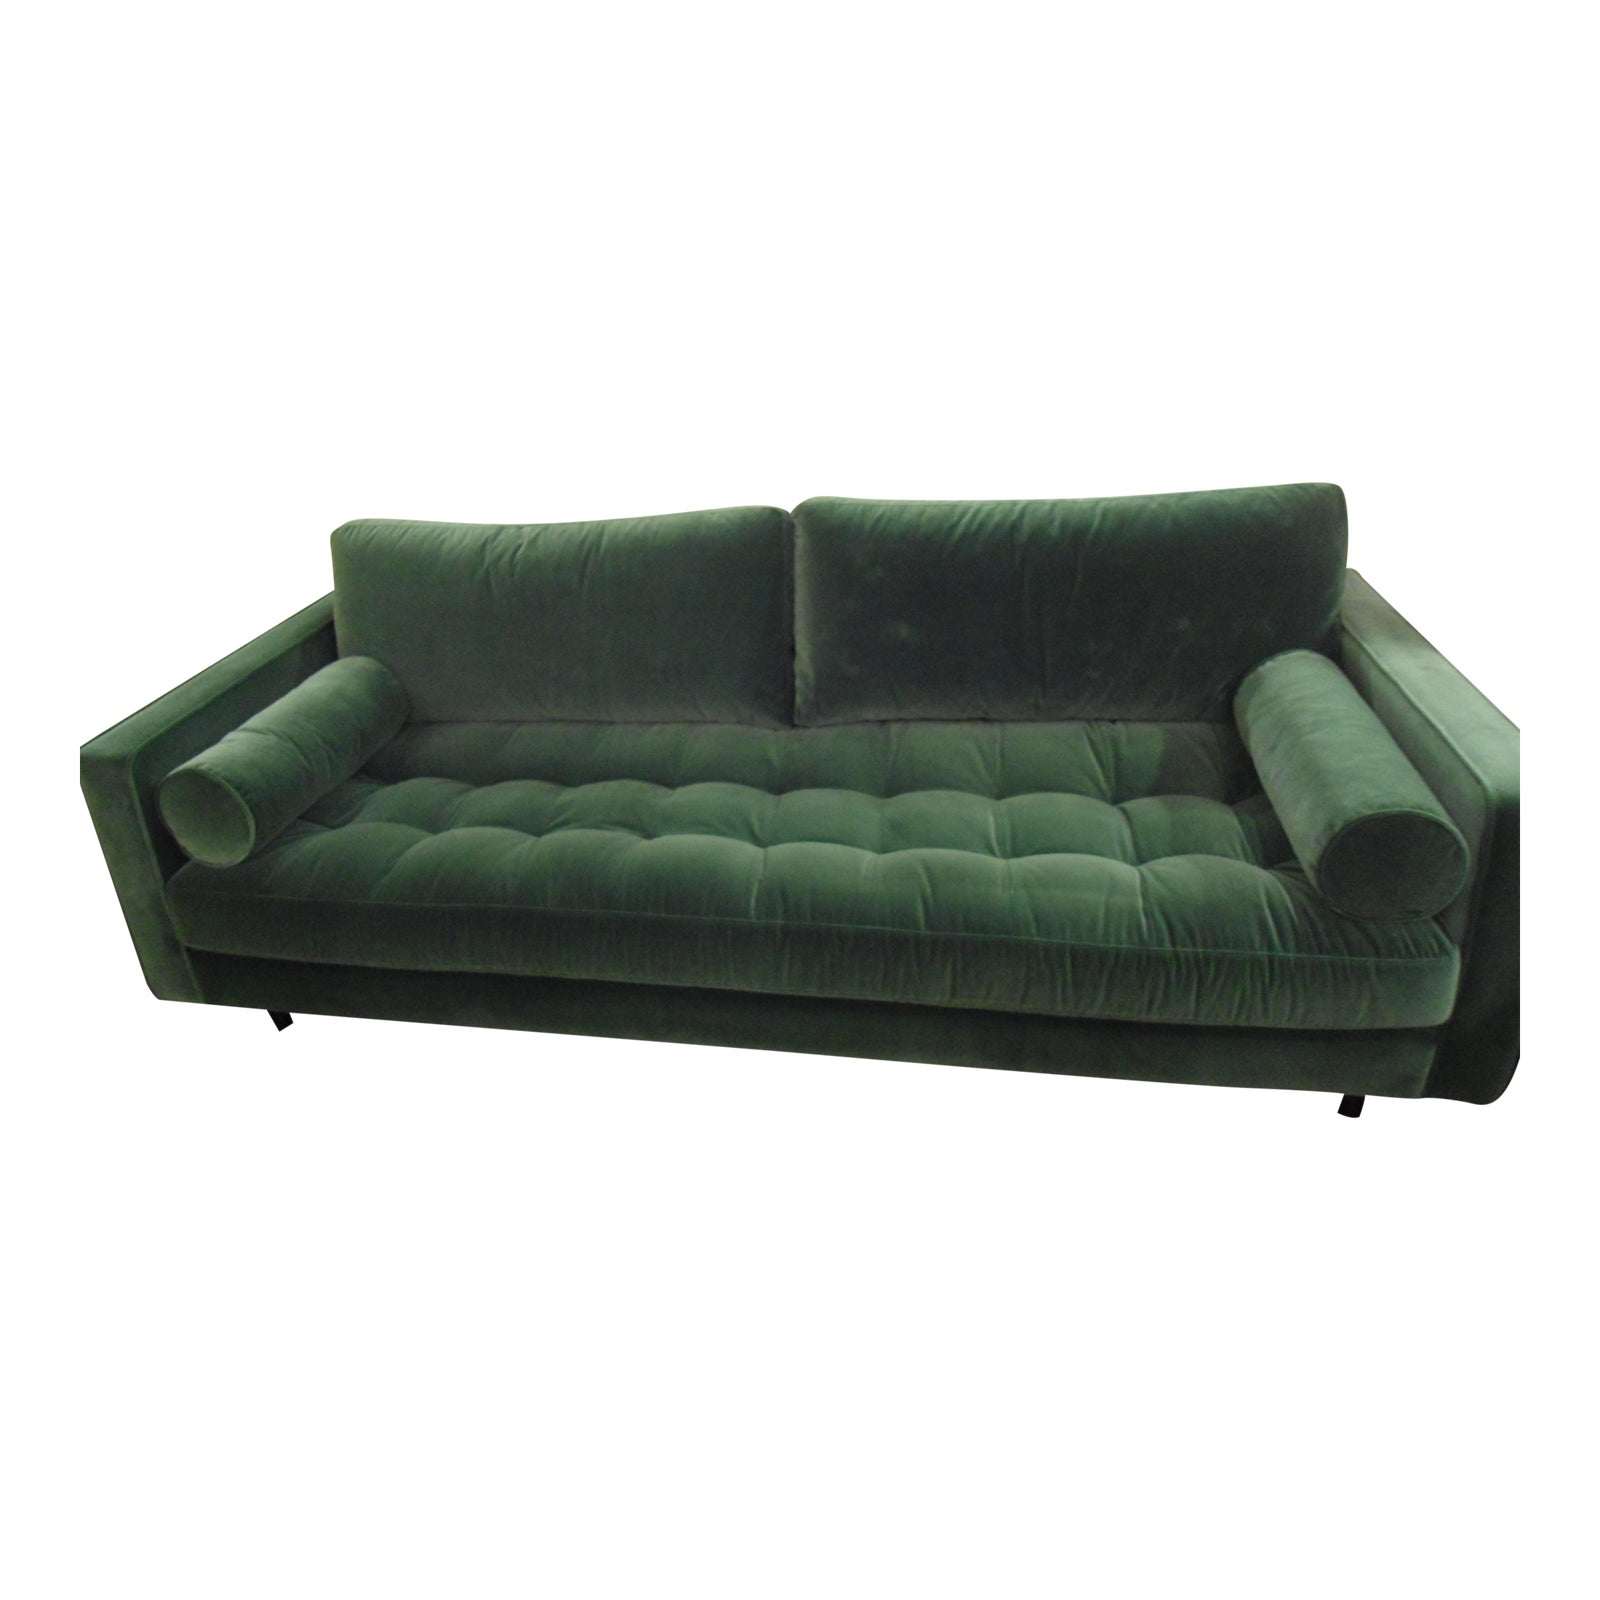 Surprising Sven Grass Green Sofa W Bolster Pillows By Article Evergreenethics Interior Chair Design Evergreenethicsorg